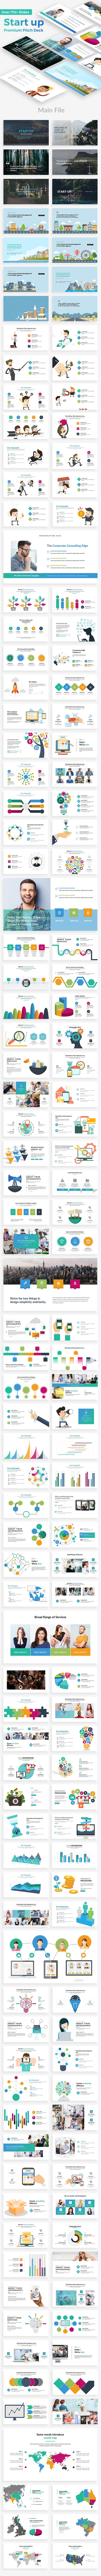 Startup Pitch Deck Keynote Template - Business Keynote Templates